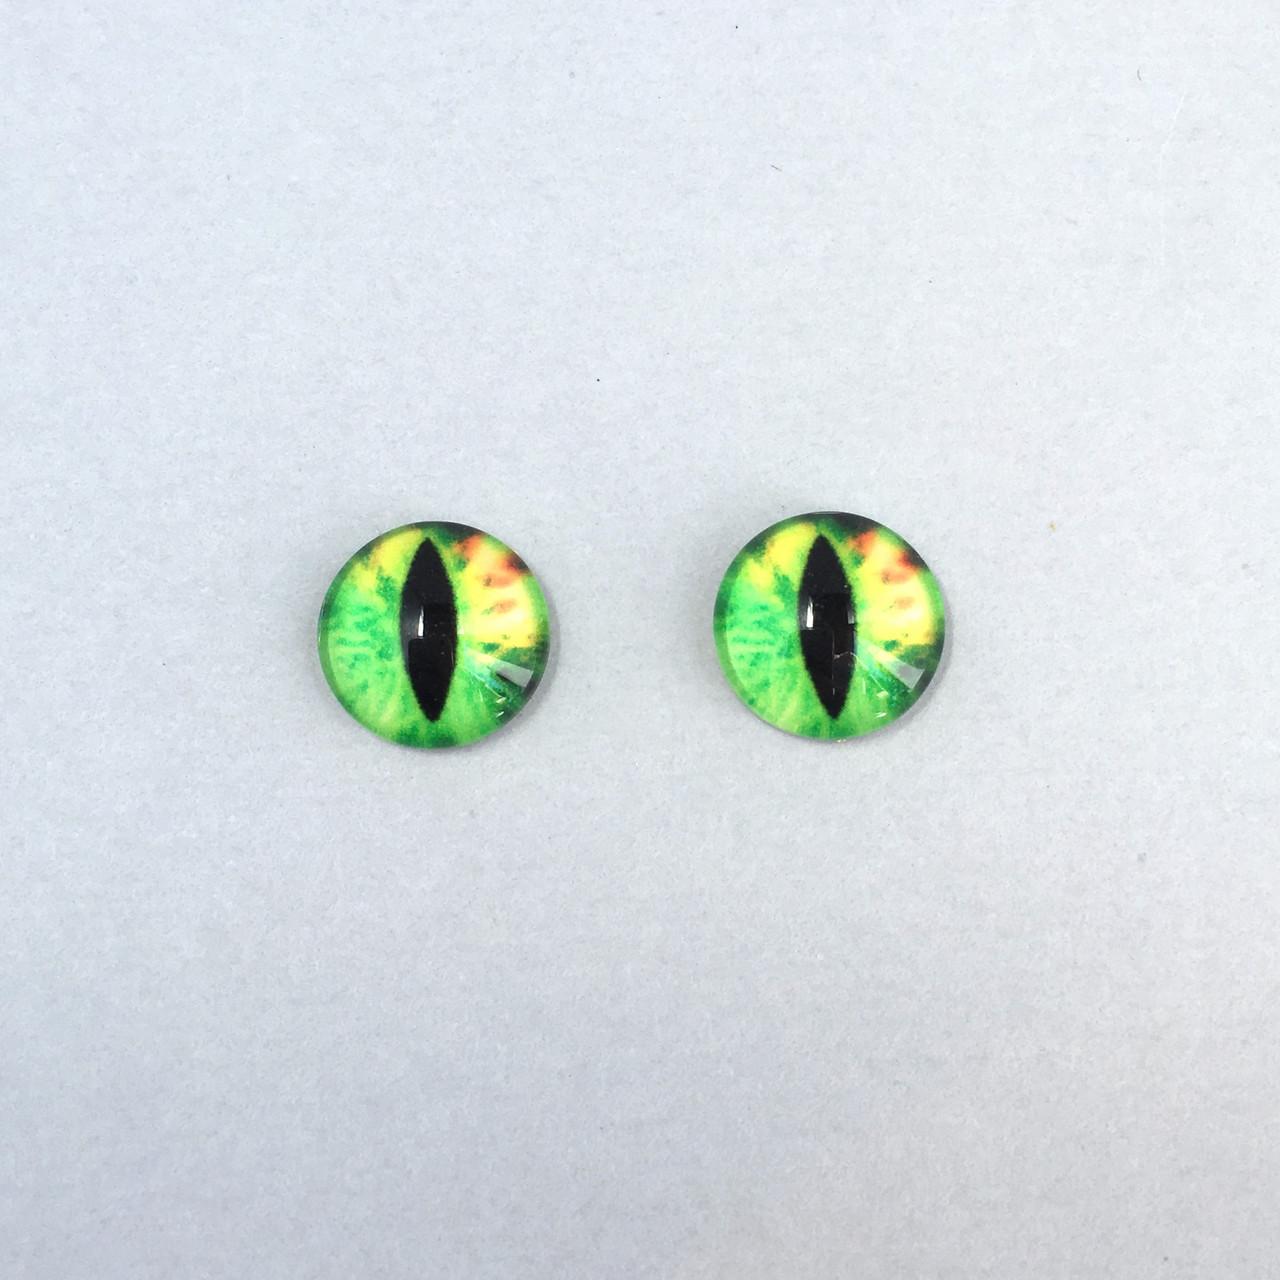 Глаза 10 мм (G-001)